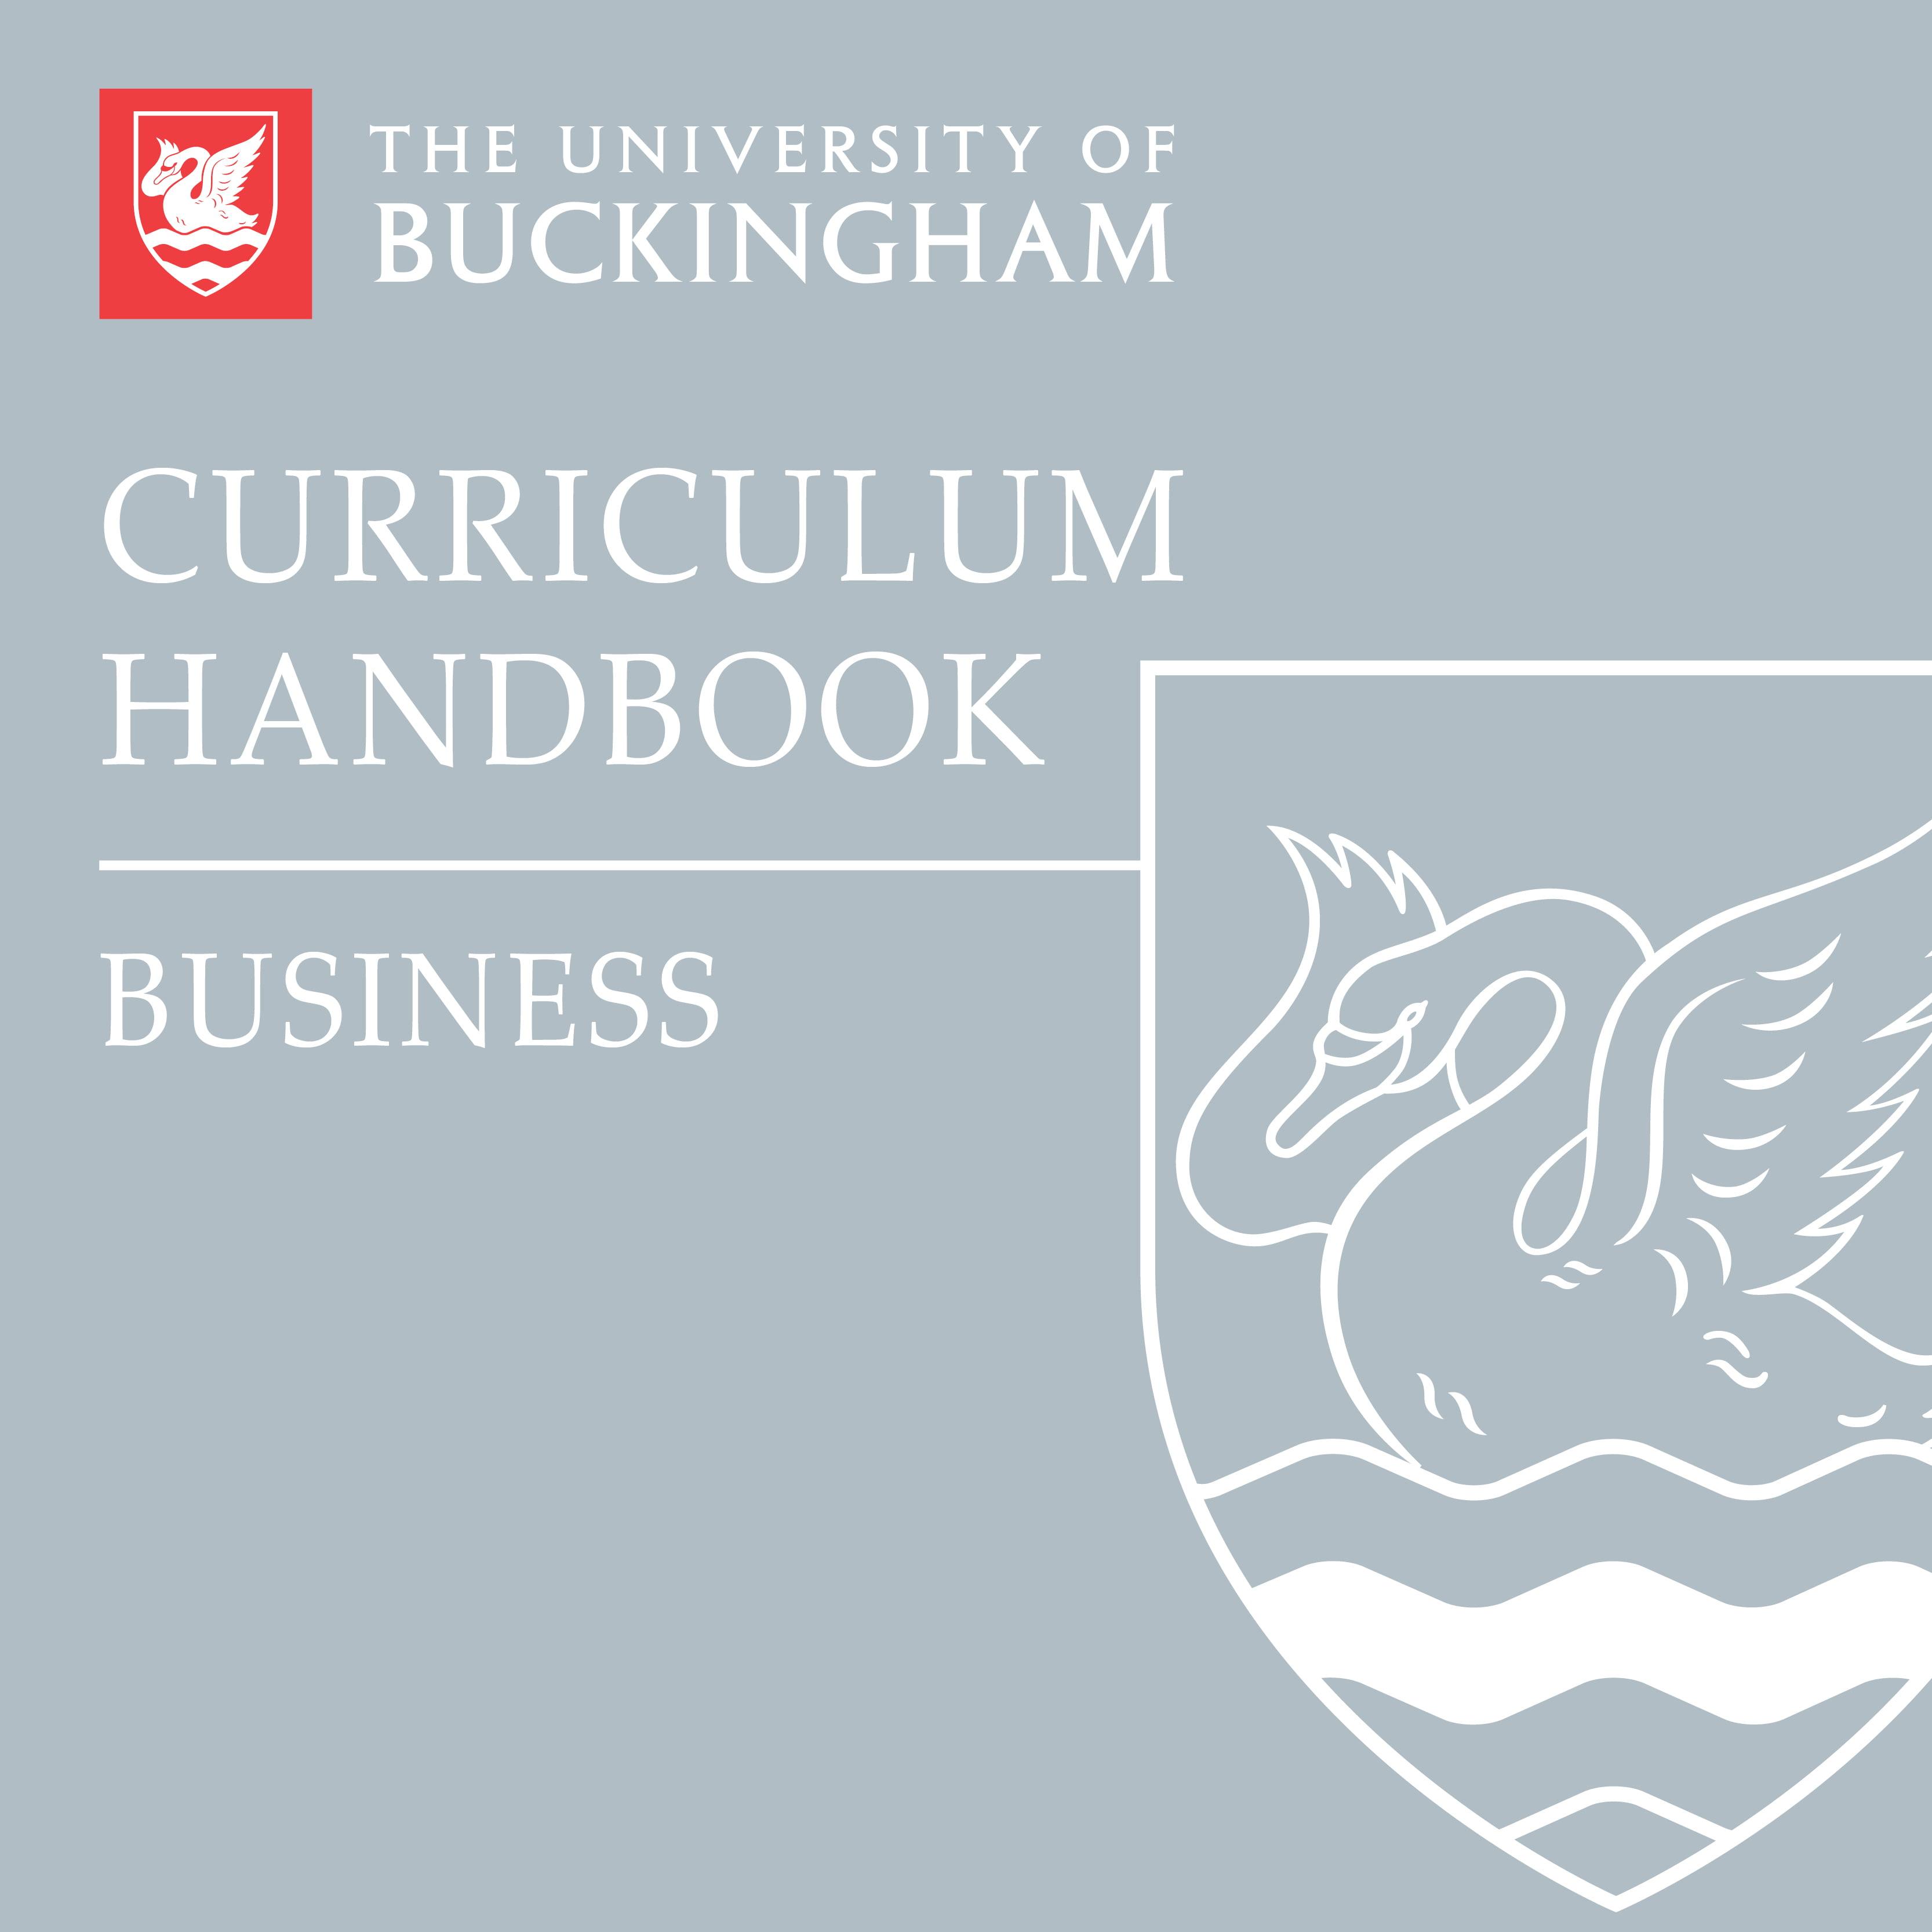 Curriculum Handbook - Business - front cover - online